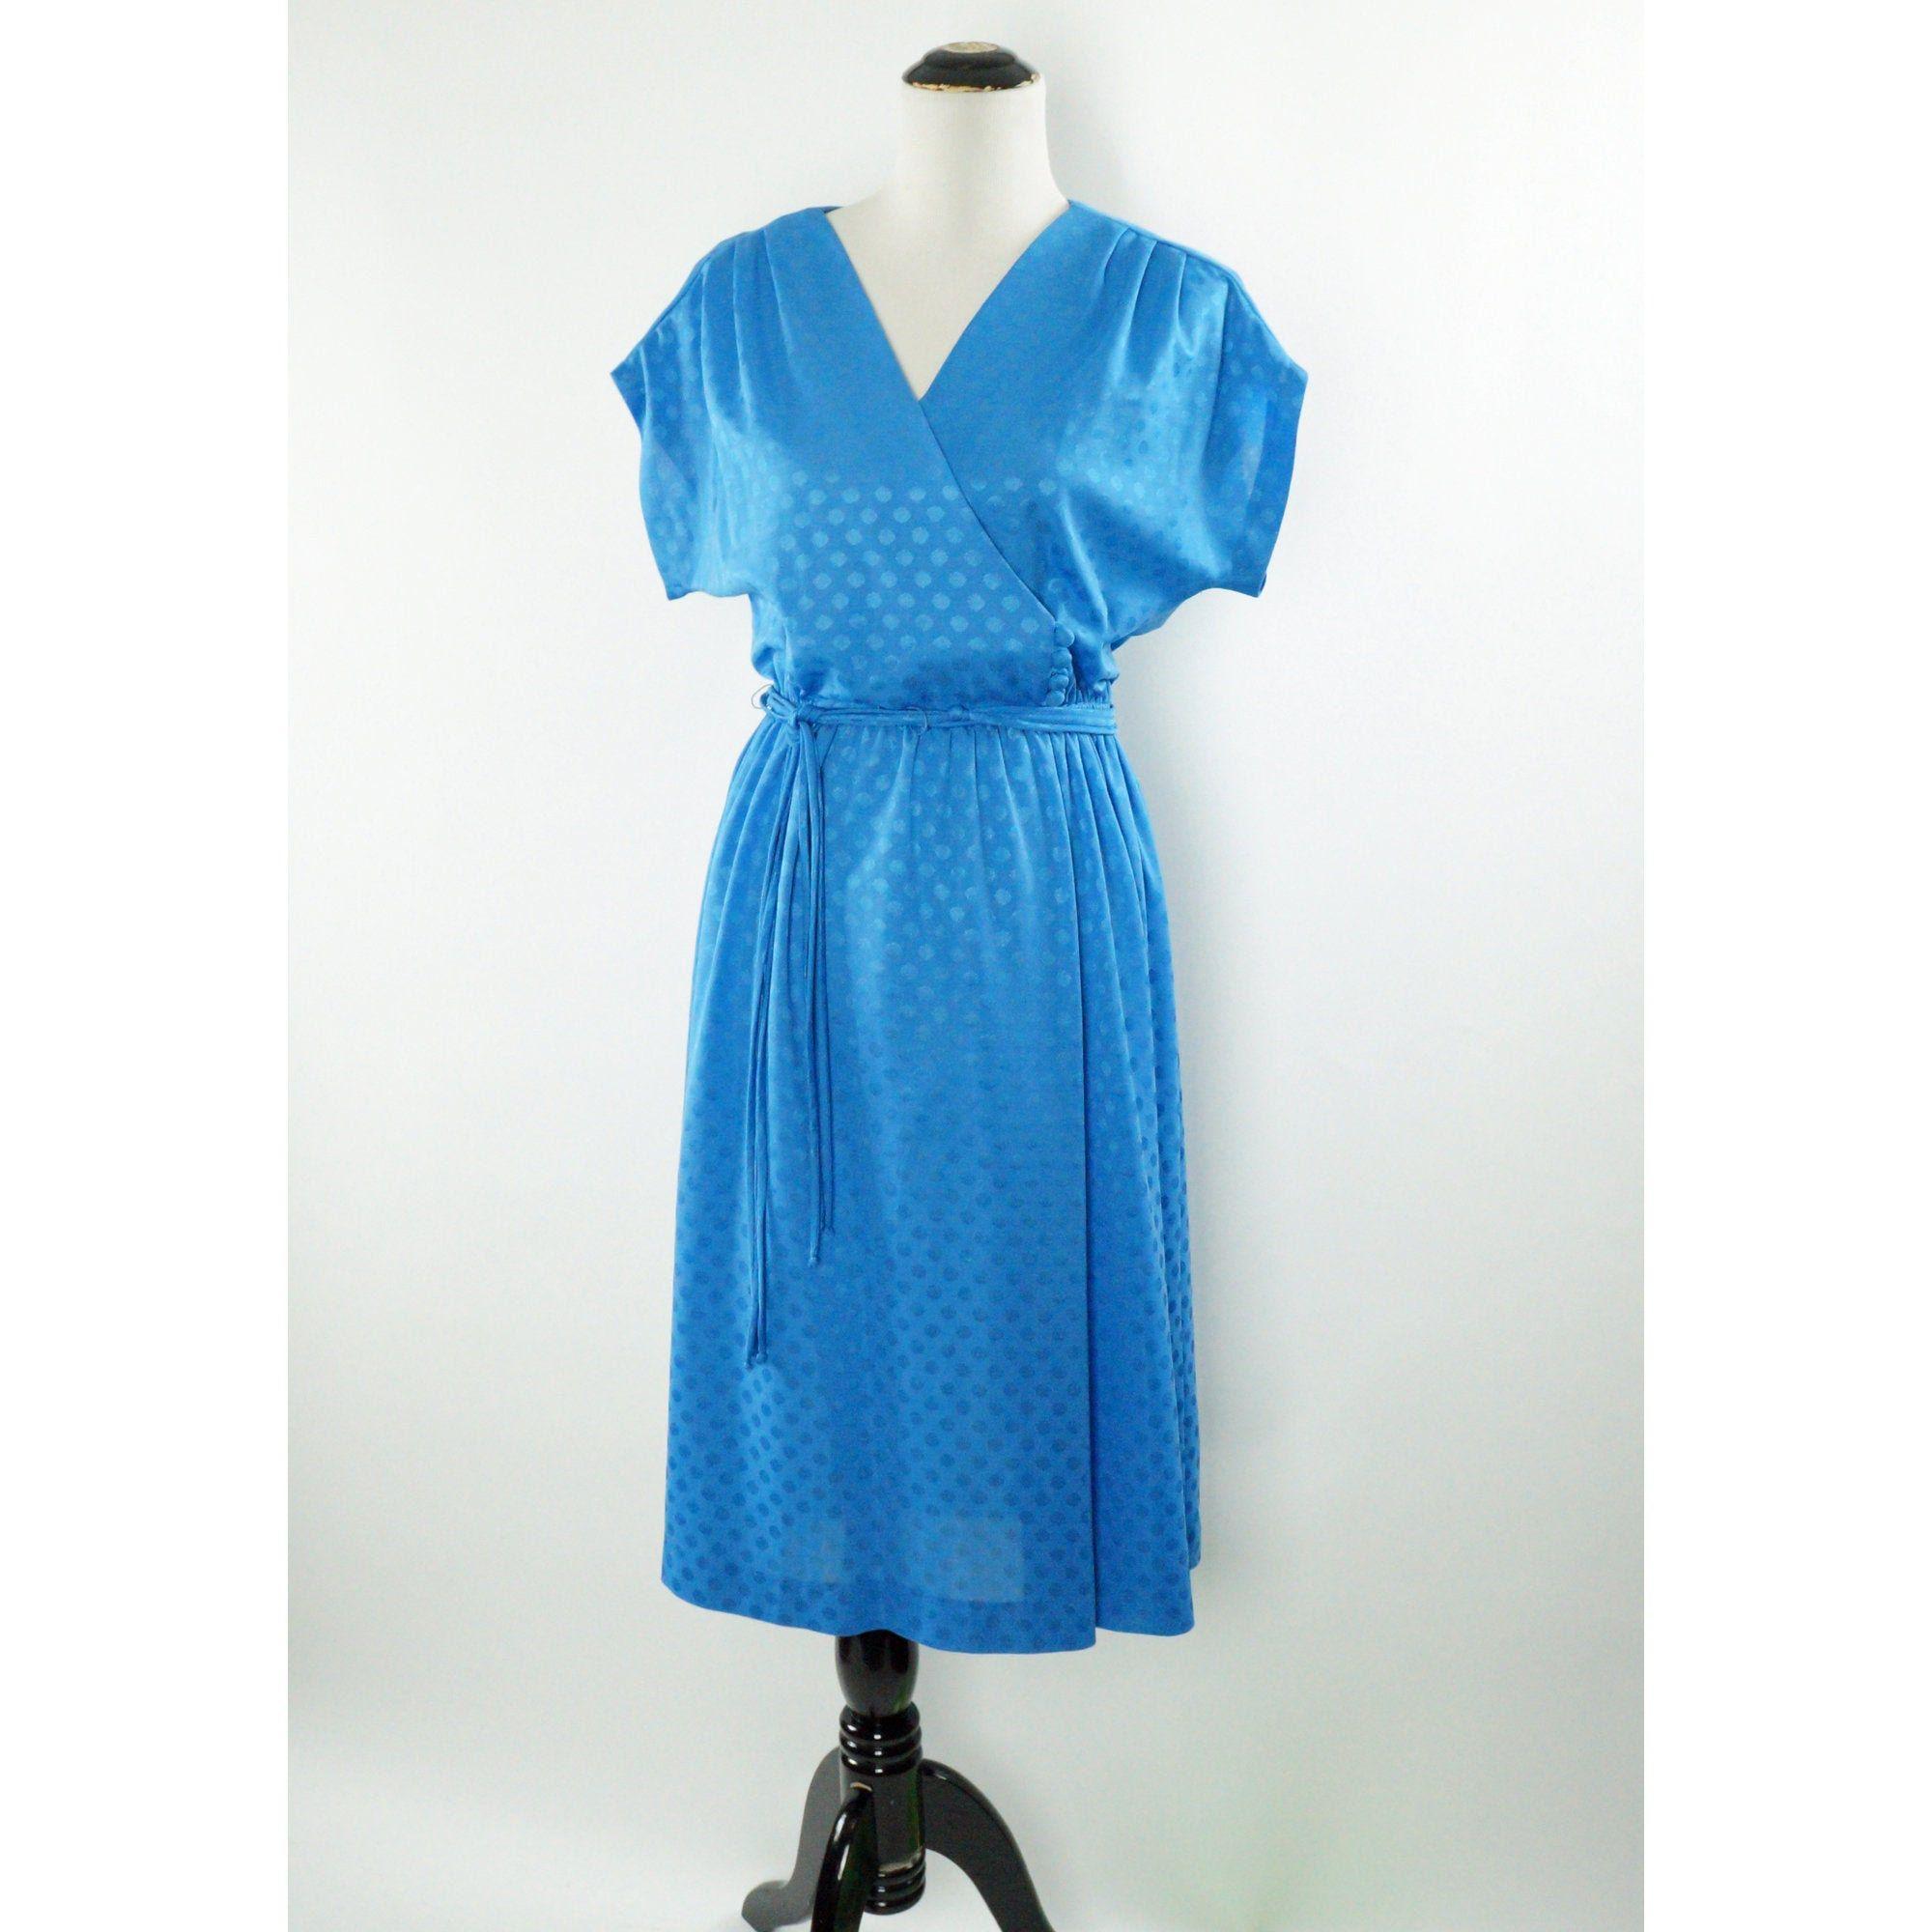 Vintage Wrap Dress 70s Blue Polka Dots Belted Tie Waist Etsy Vintage Wrap Dress Wrap Dress Vintage Wraps [ 2000 x 2000 Pixel ]